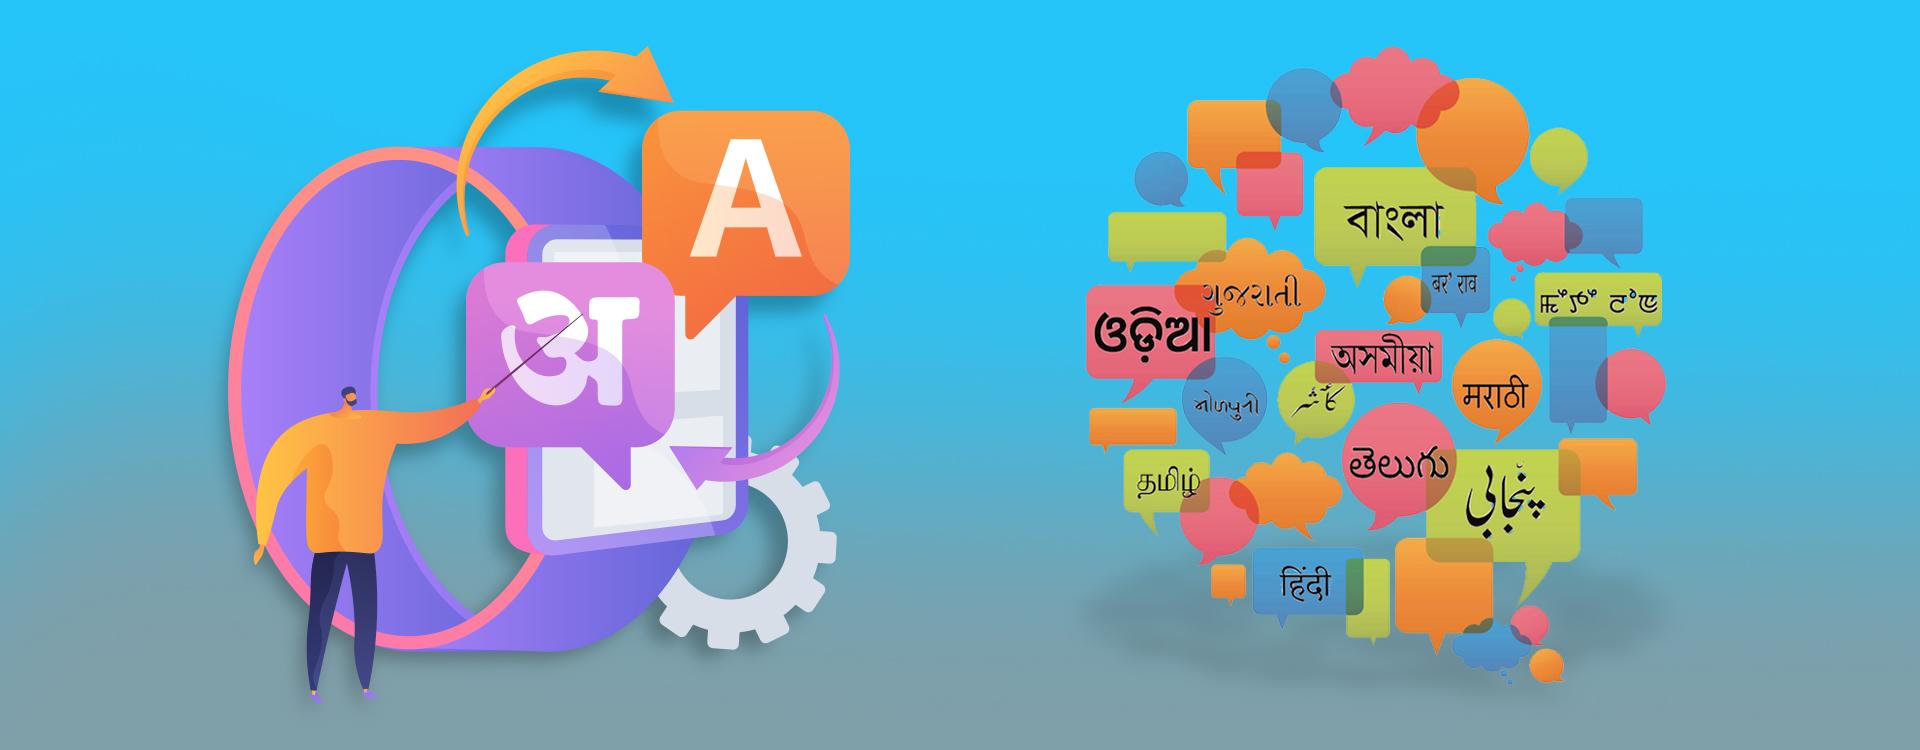 Vernacular Content Market of India